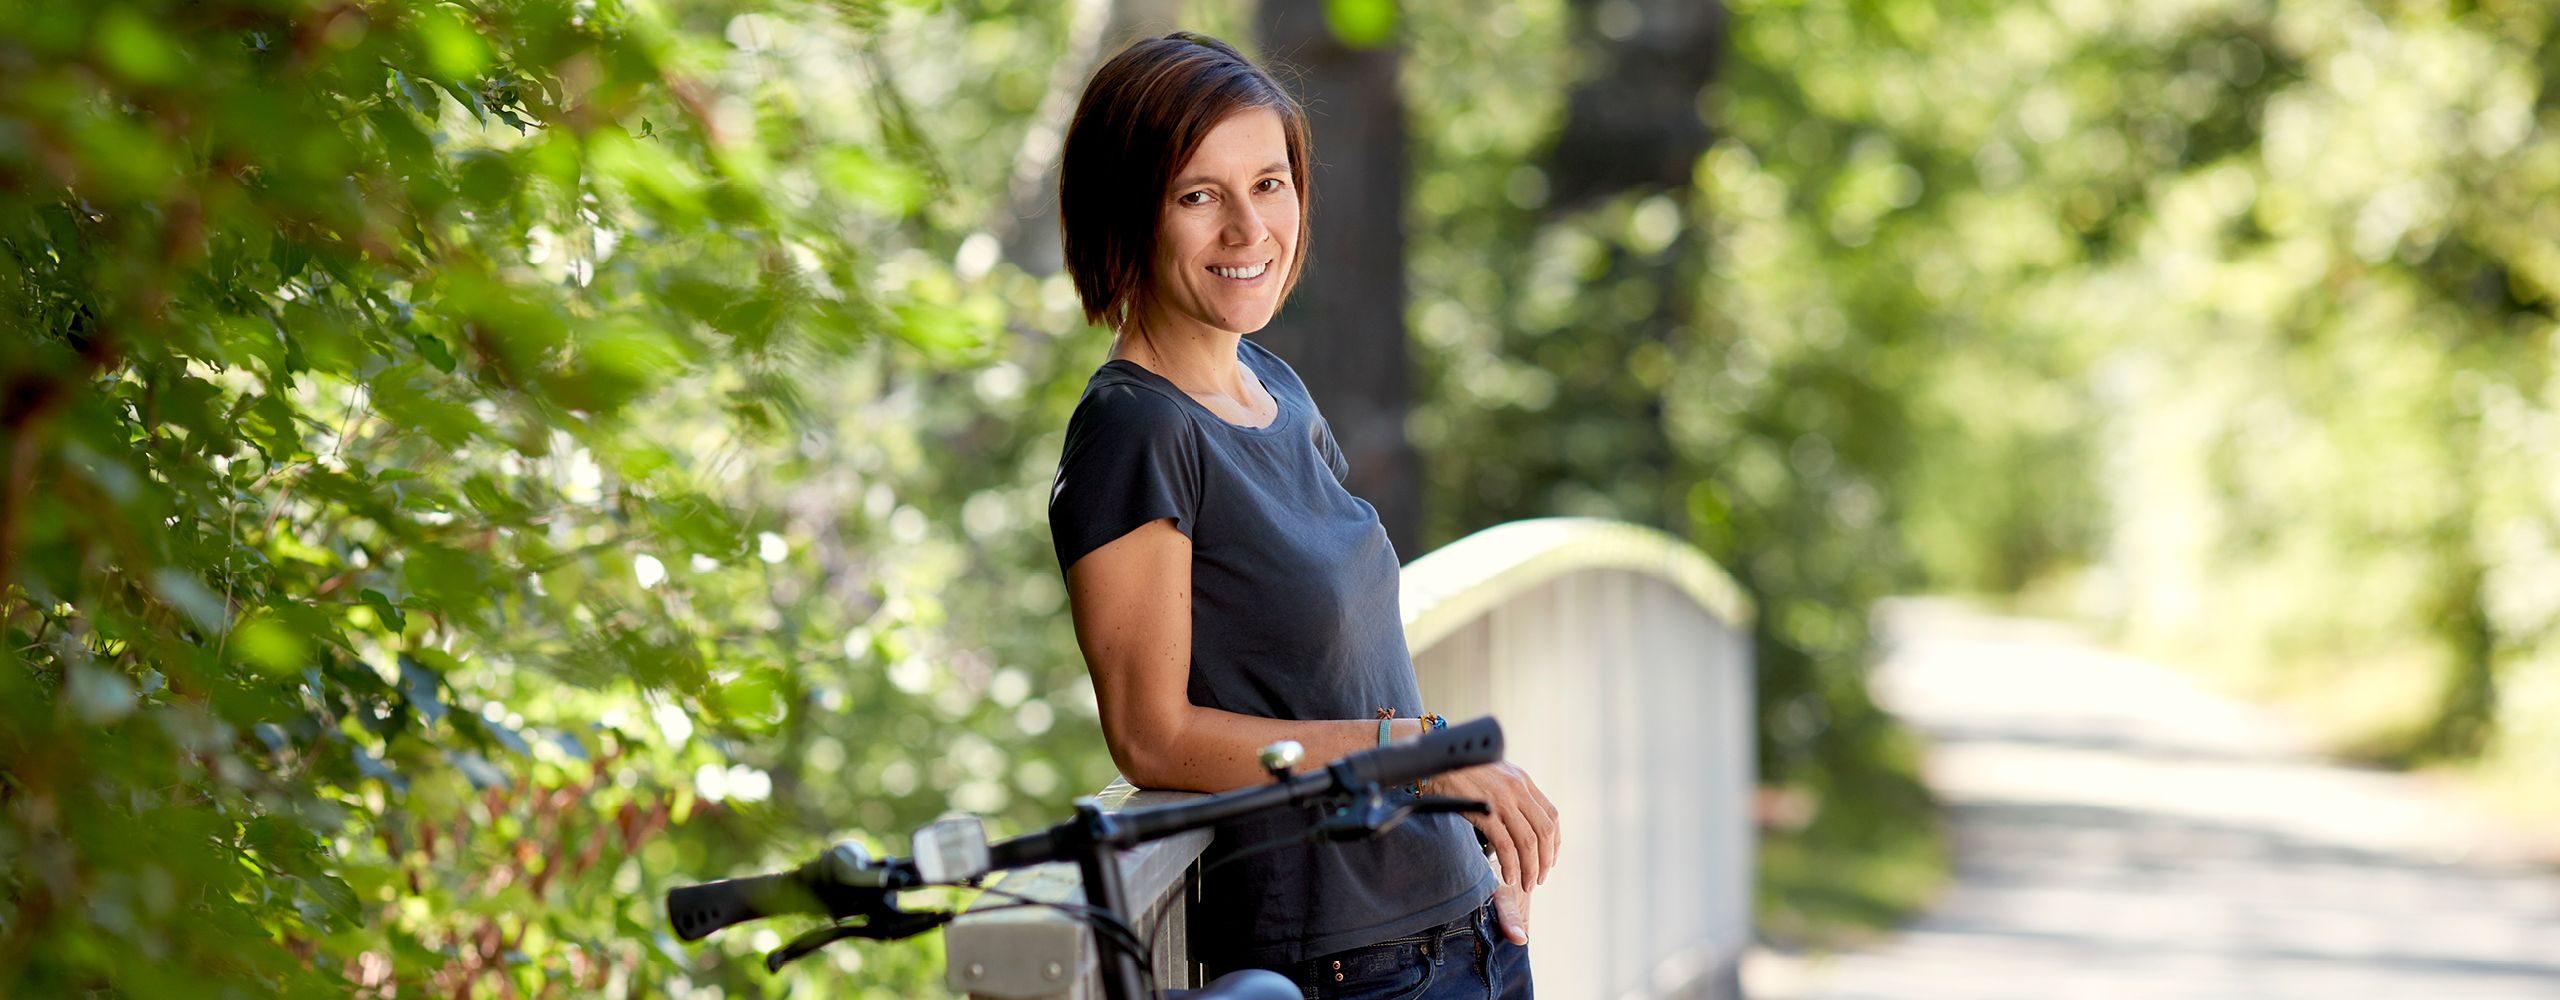 Schauspielerin Pia Herzegger fährt Fahrrad. #warumfährstDUnicht Foto: Ian Ehm